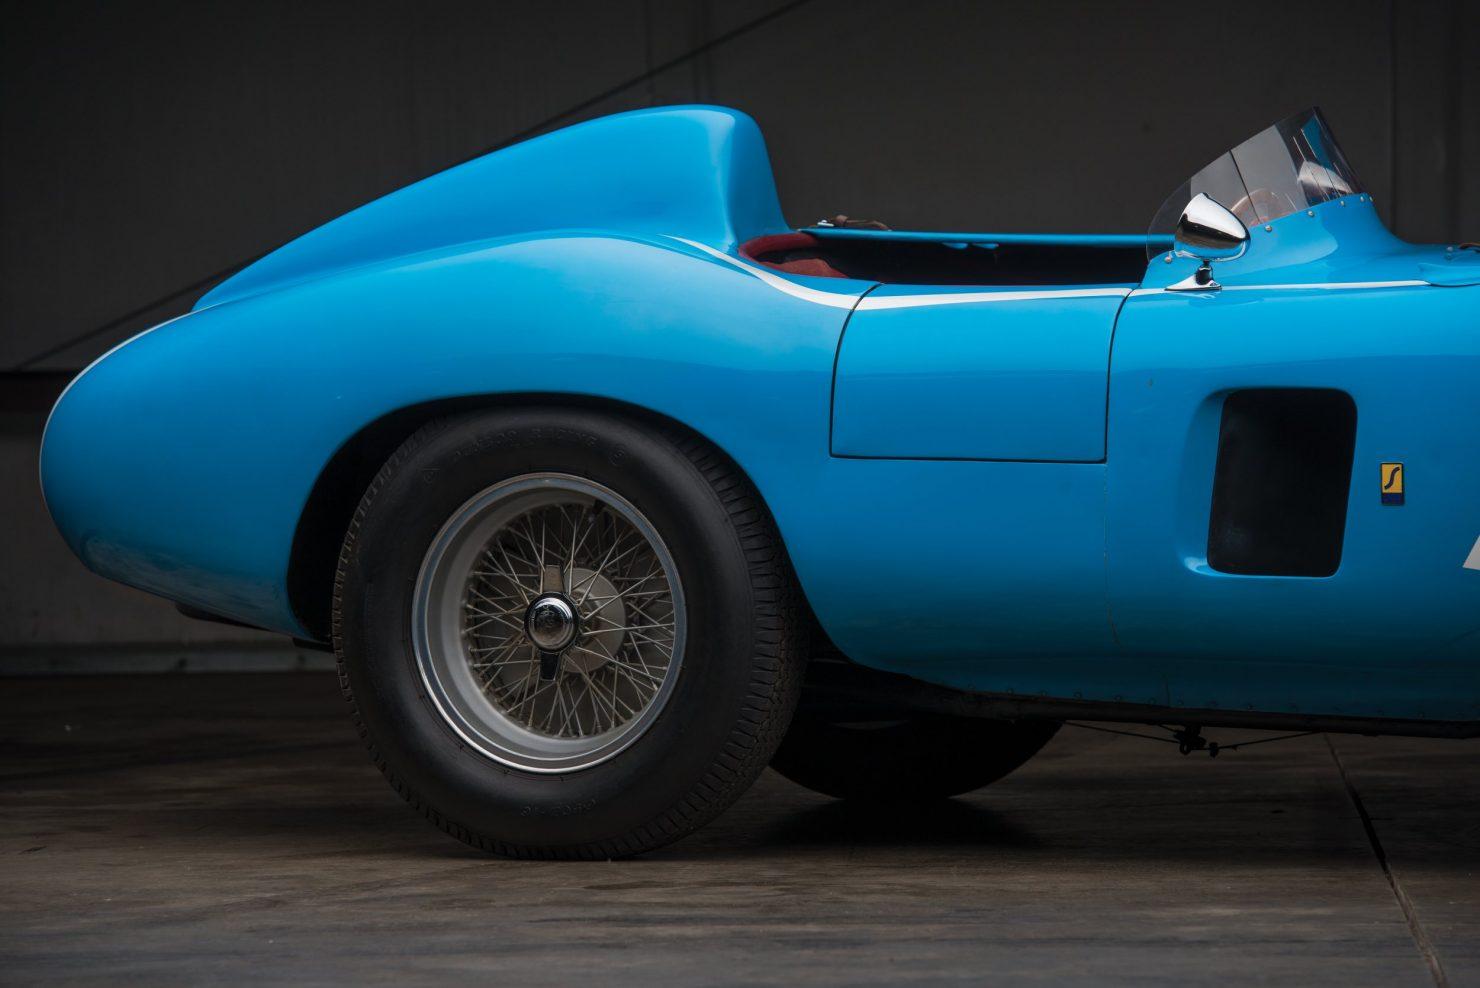 ferrari 121 lm spider 17 1480x988 - 1955 Ferrari 121 LM